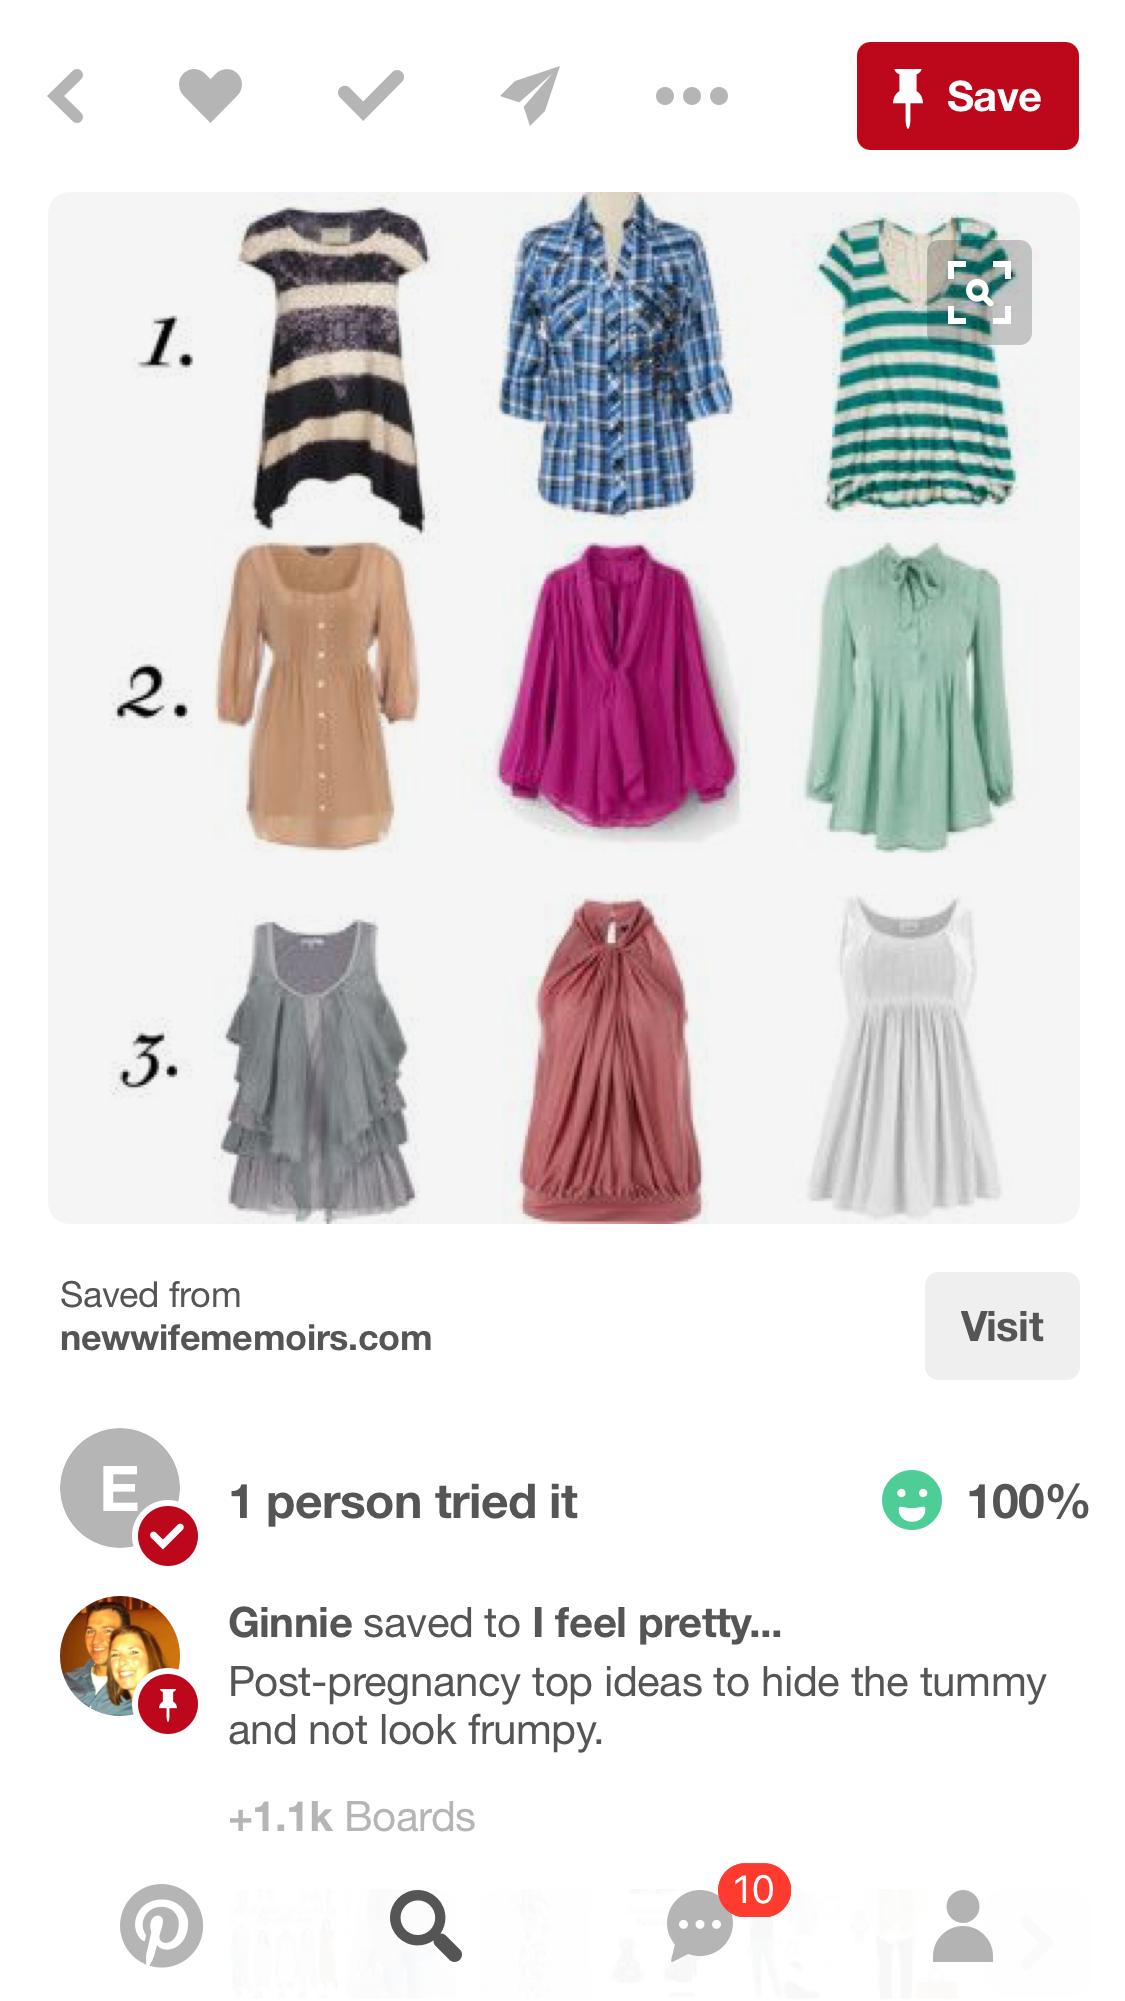 d2e3291923f2c Pregnancy Dress, Post Pregnancy Fashion, Post Baby Fashion, Postpartum  Fashion, Pregnancy Outfits